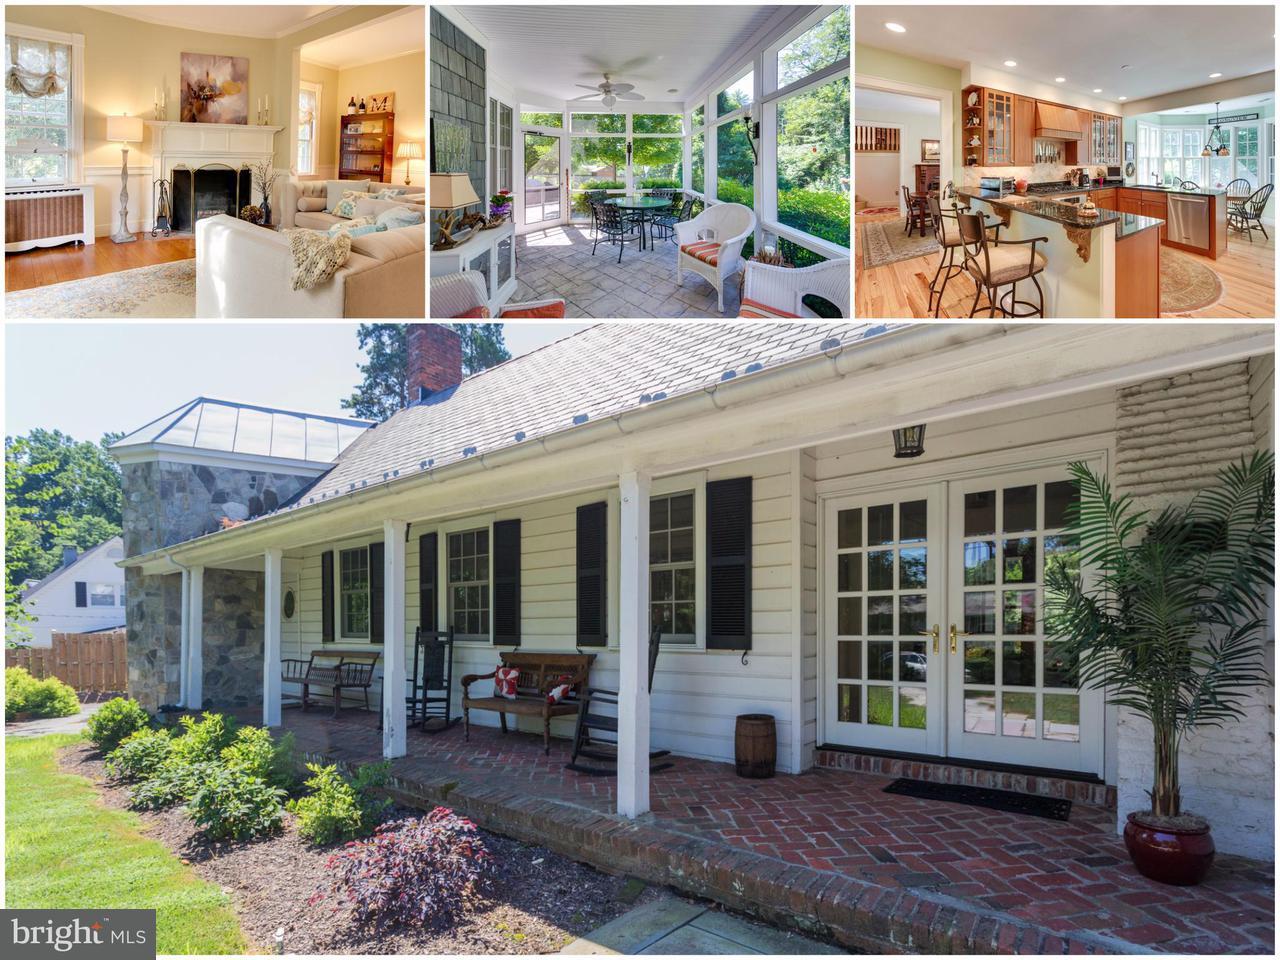 Single Family Home for Sale at 2606 Ogden Street 2606 Ogden Street Falls Church, Virginia 22043 United States